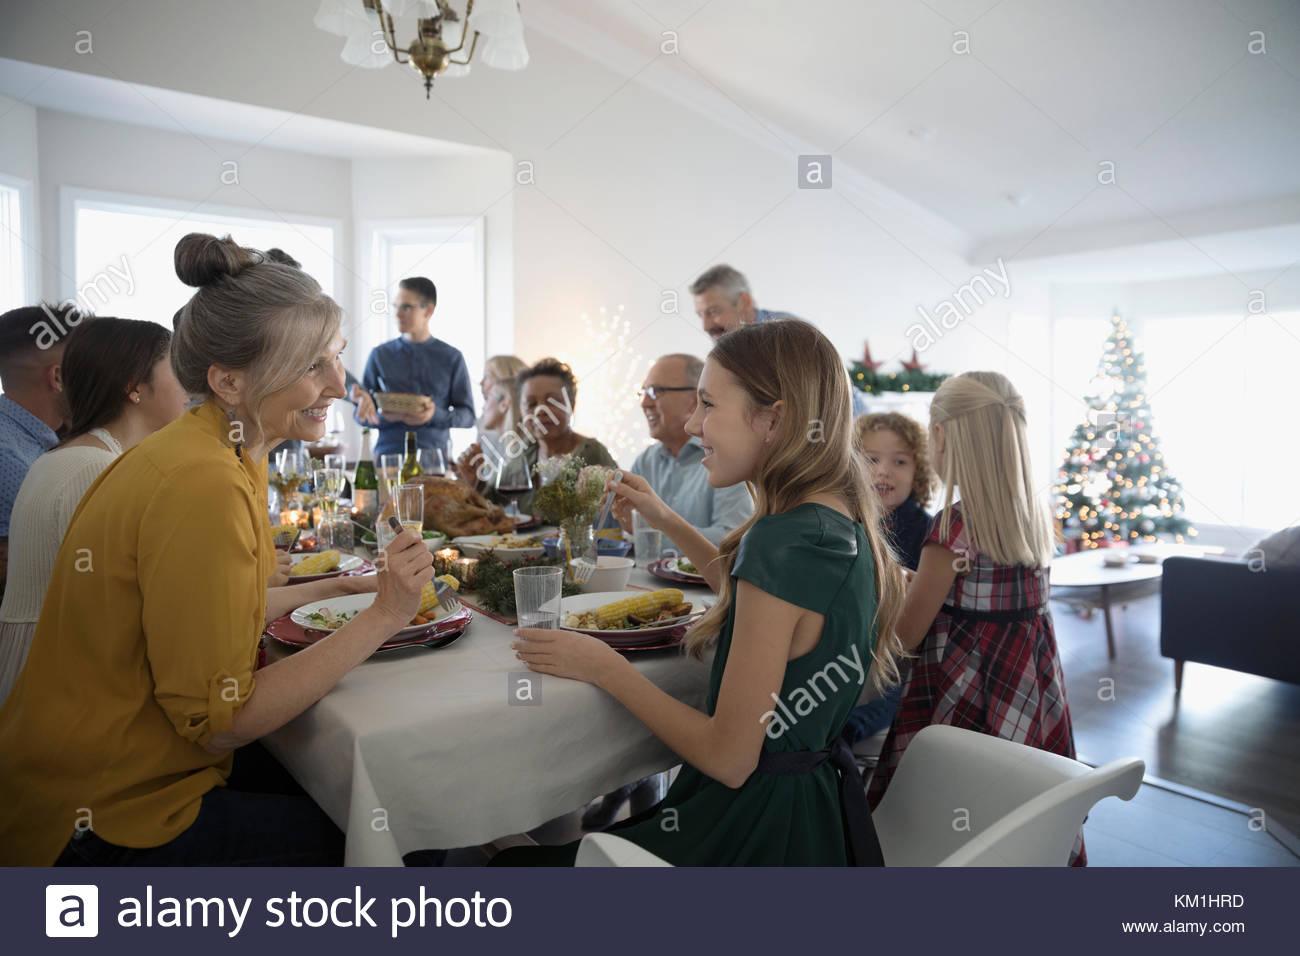 Multi-generation family enjoying Christmas dinner at table - Stock Image